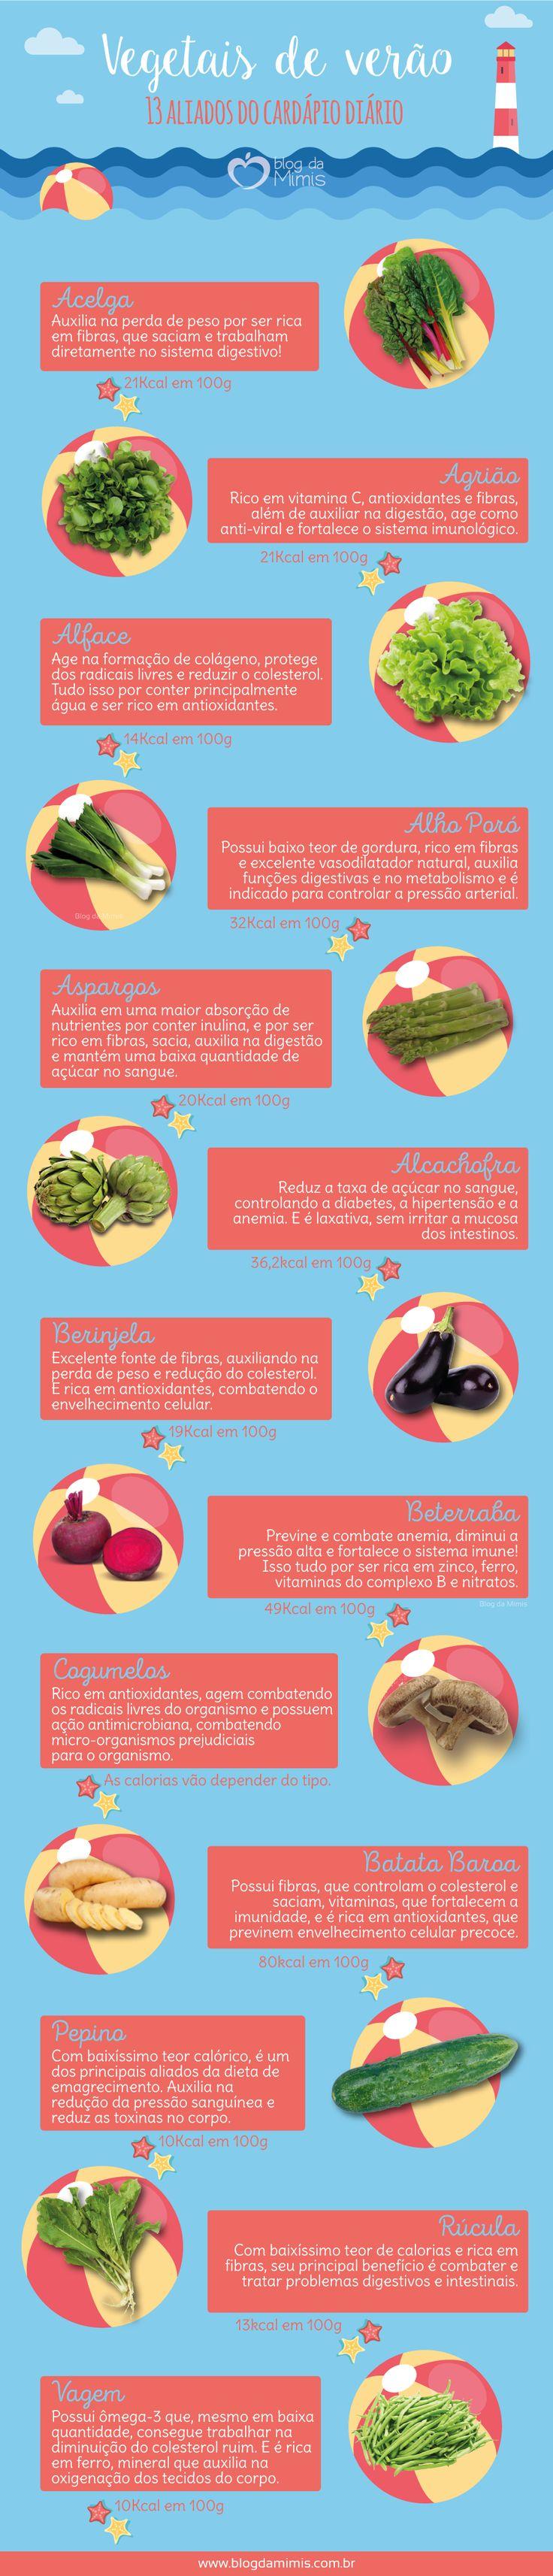 vegetais-de-verao-blog-da-mimis-michelle-franzoni-post